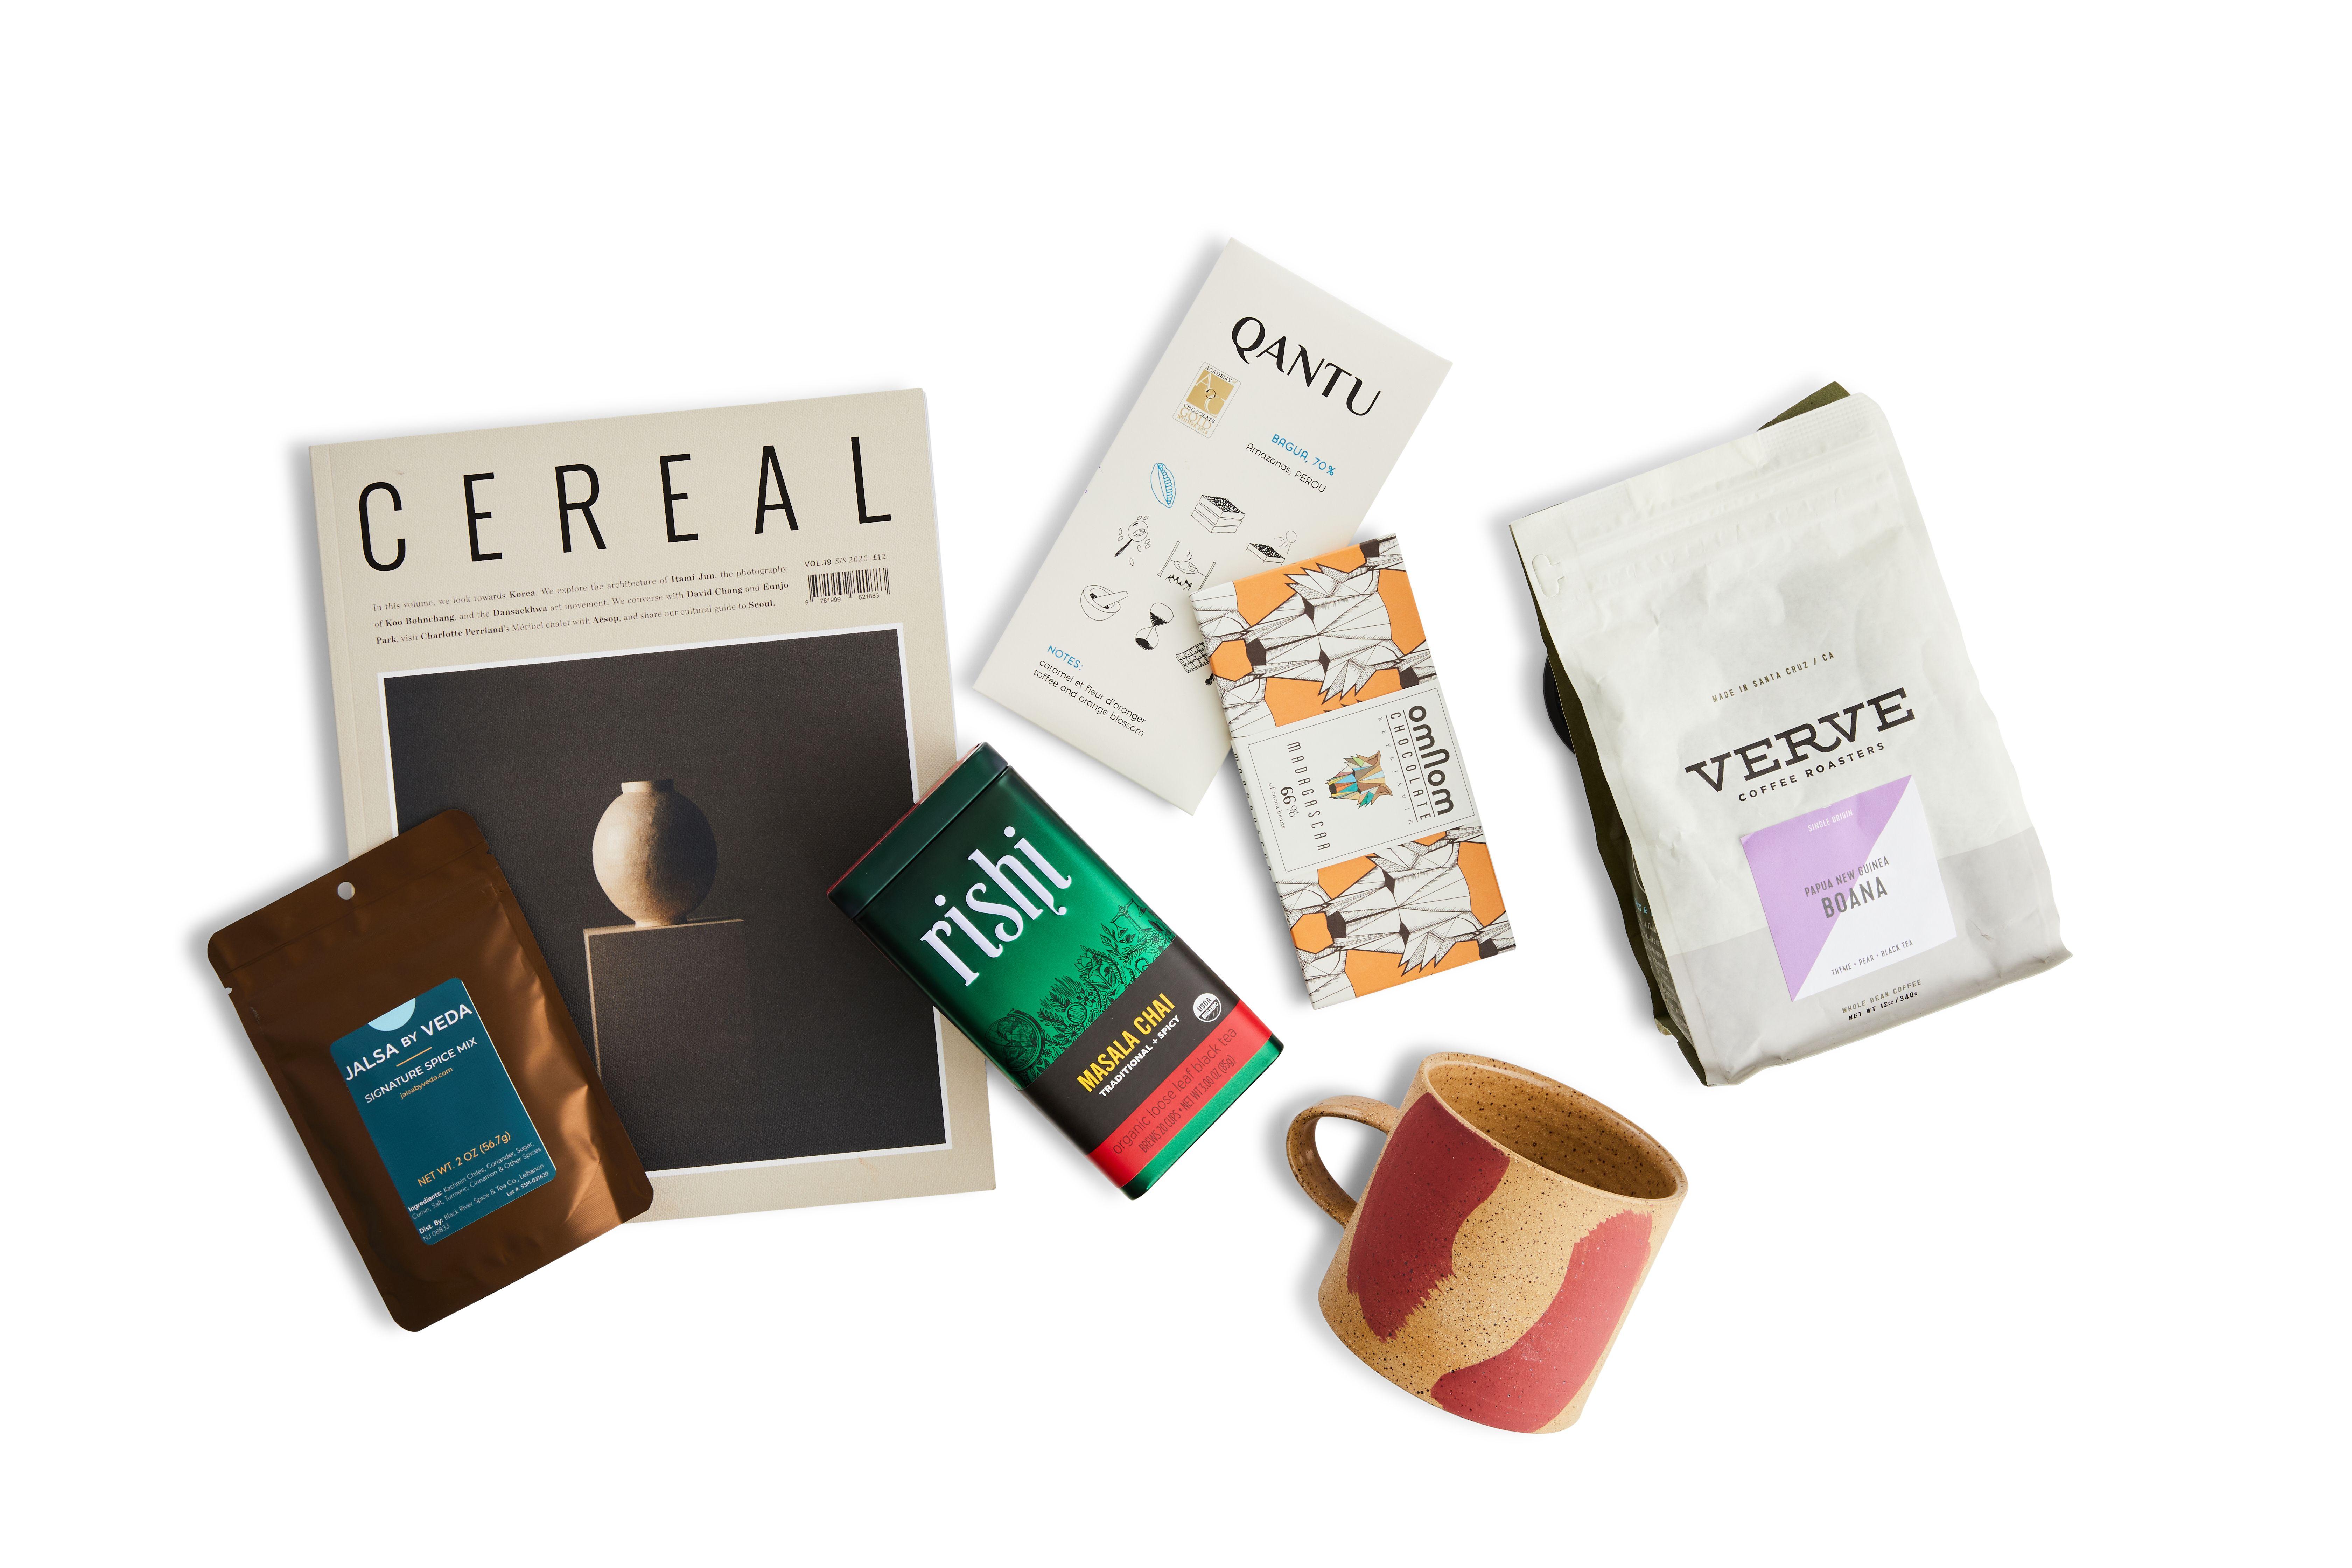 The Global Gift Basket